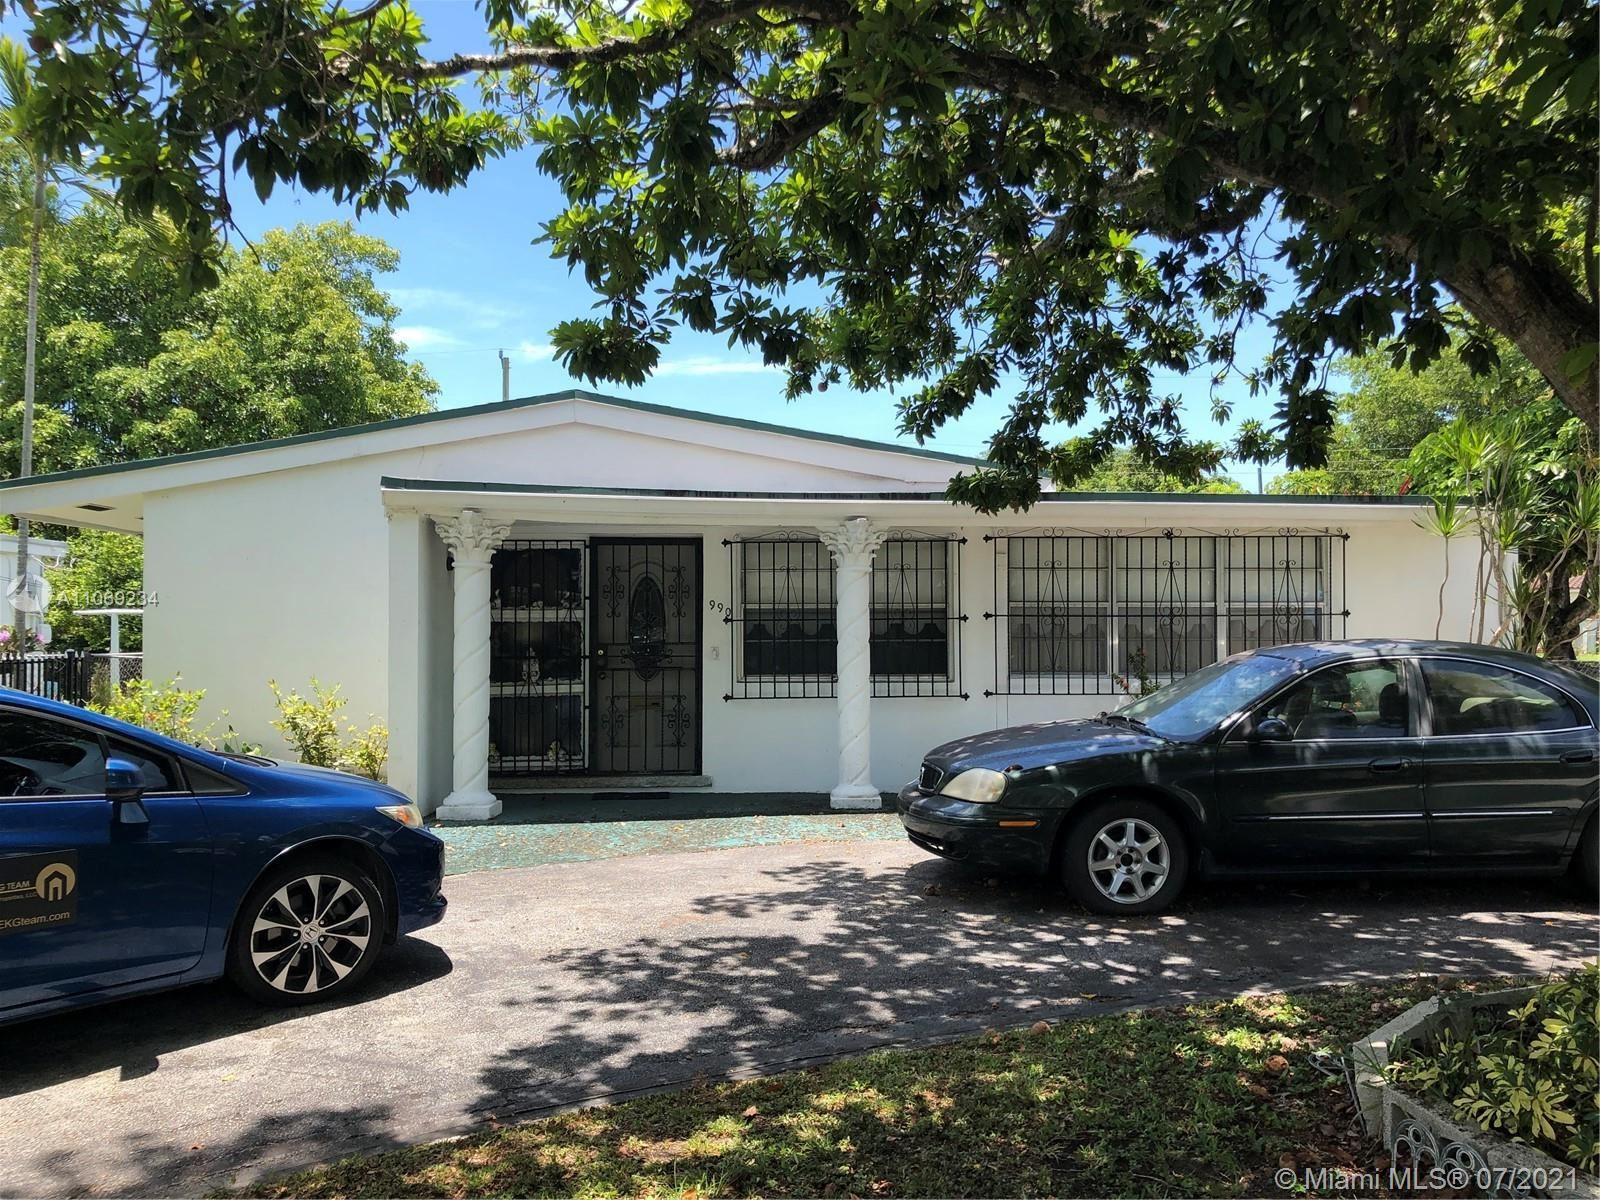 990 NW 132nd St, North Miami, FL 33168 - #: A11069234